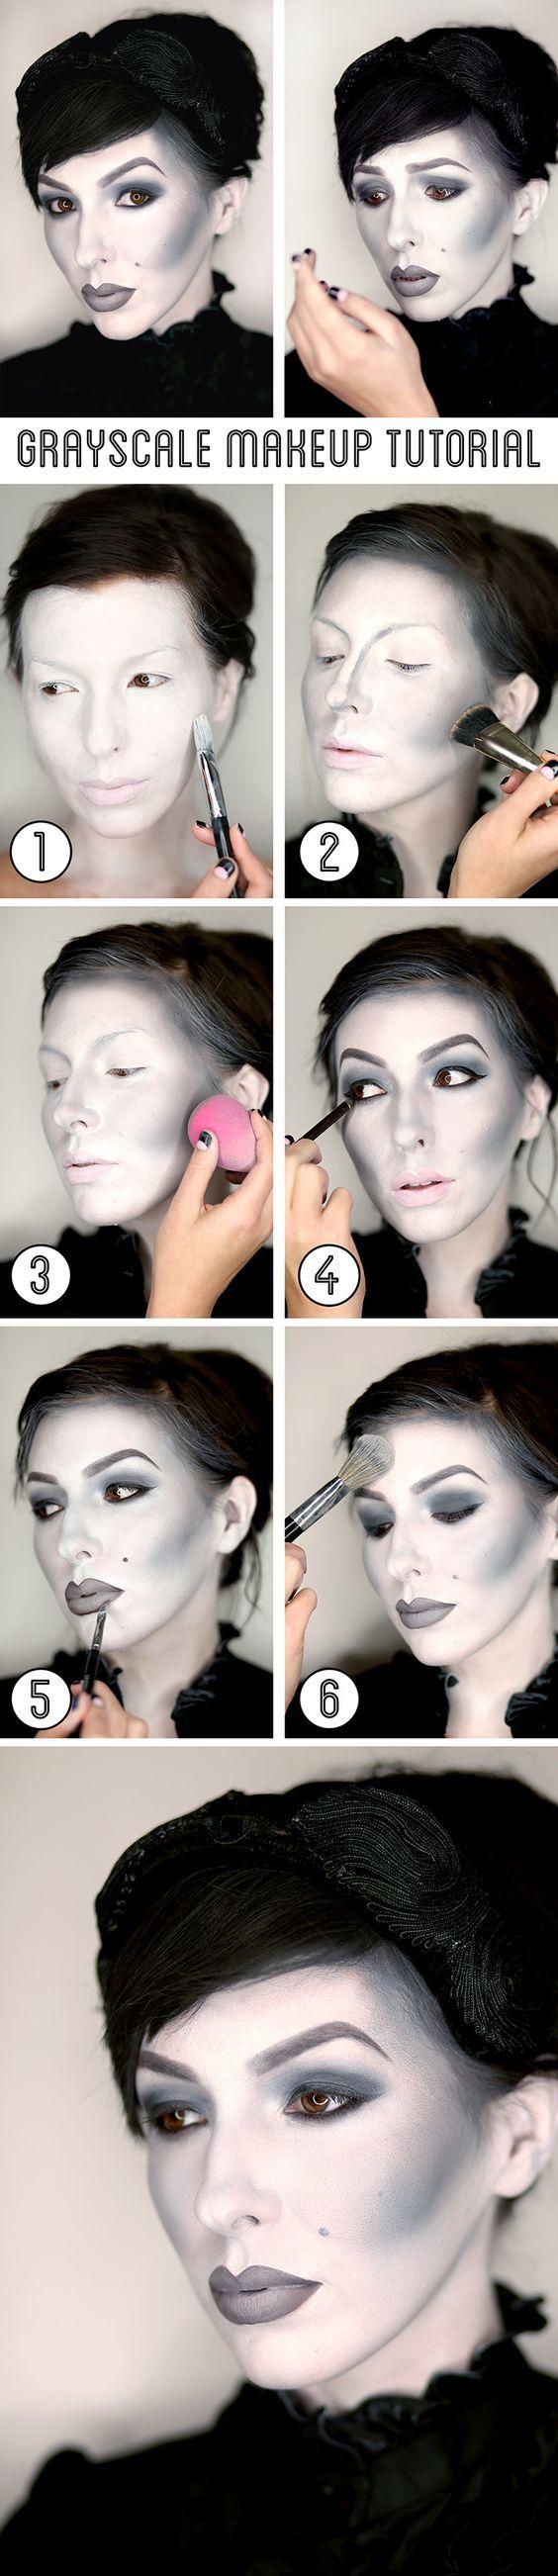 Keiko Lynnus grayscale makeup tutorial  black and white Halloween